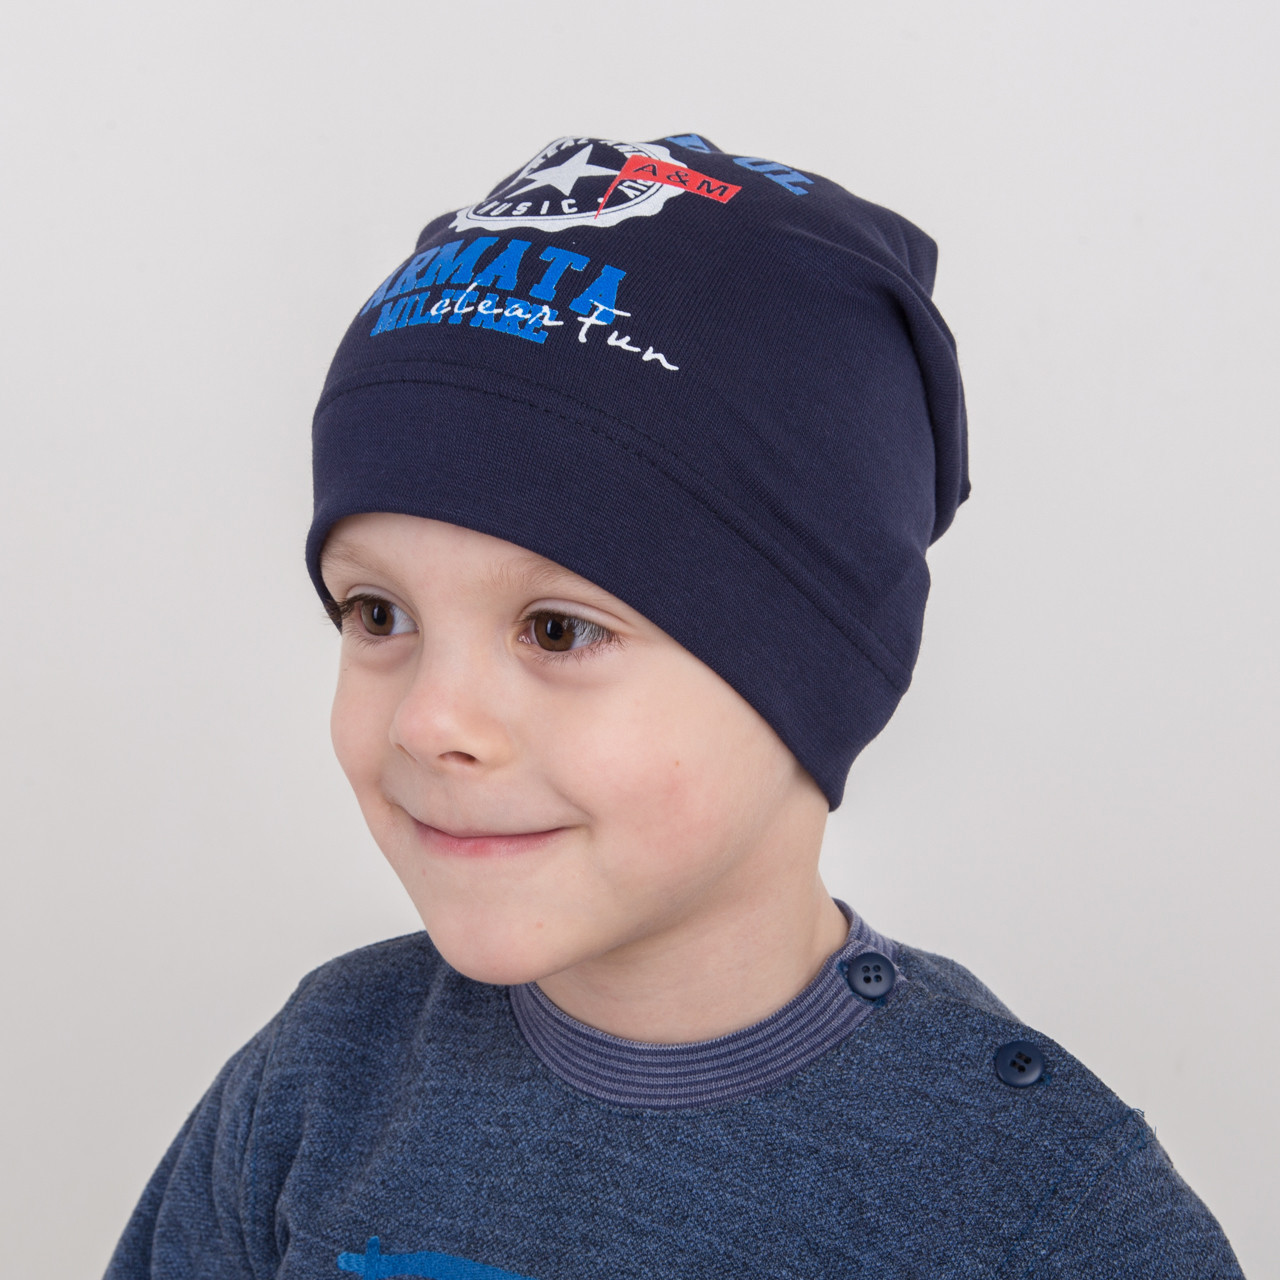 Весенняя хлопковая шапка на мальчика оптом - Armata - Артикул 2170